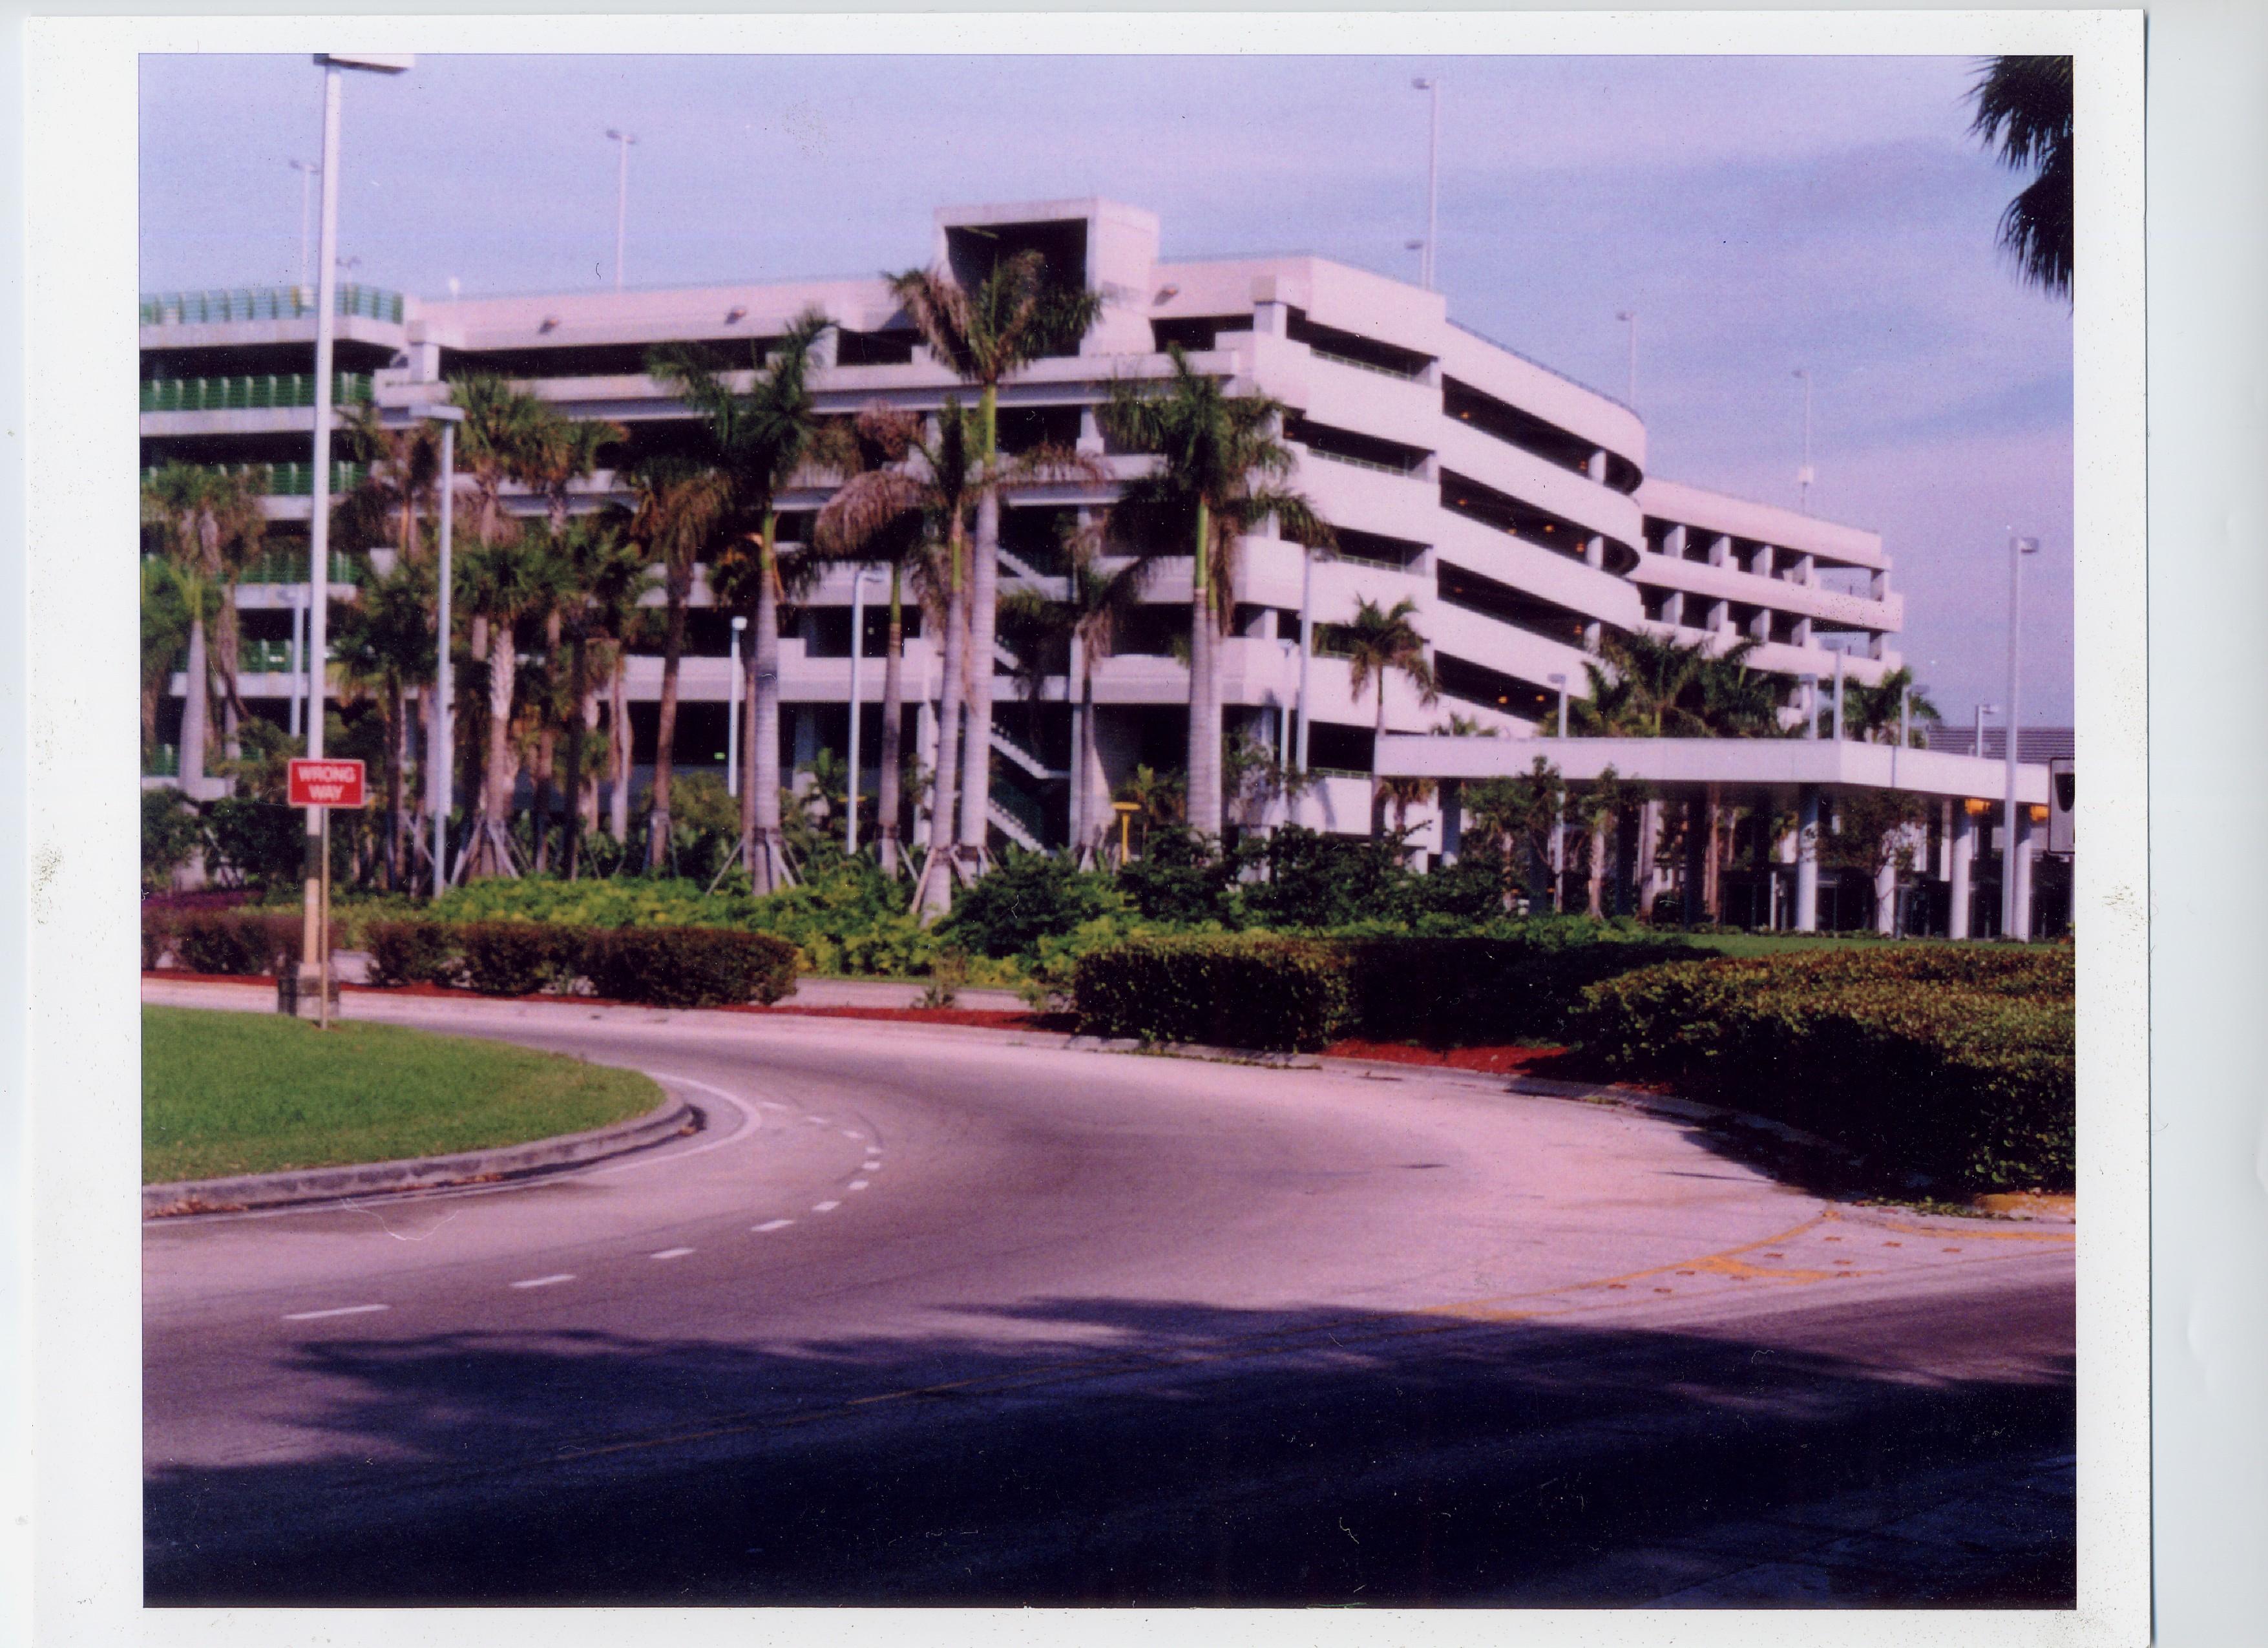 Parking Garaga_Ft Lauderdale Airport